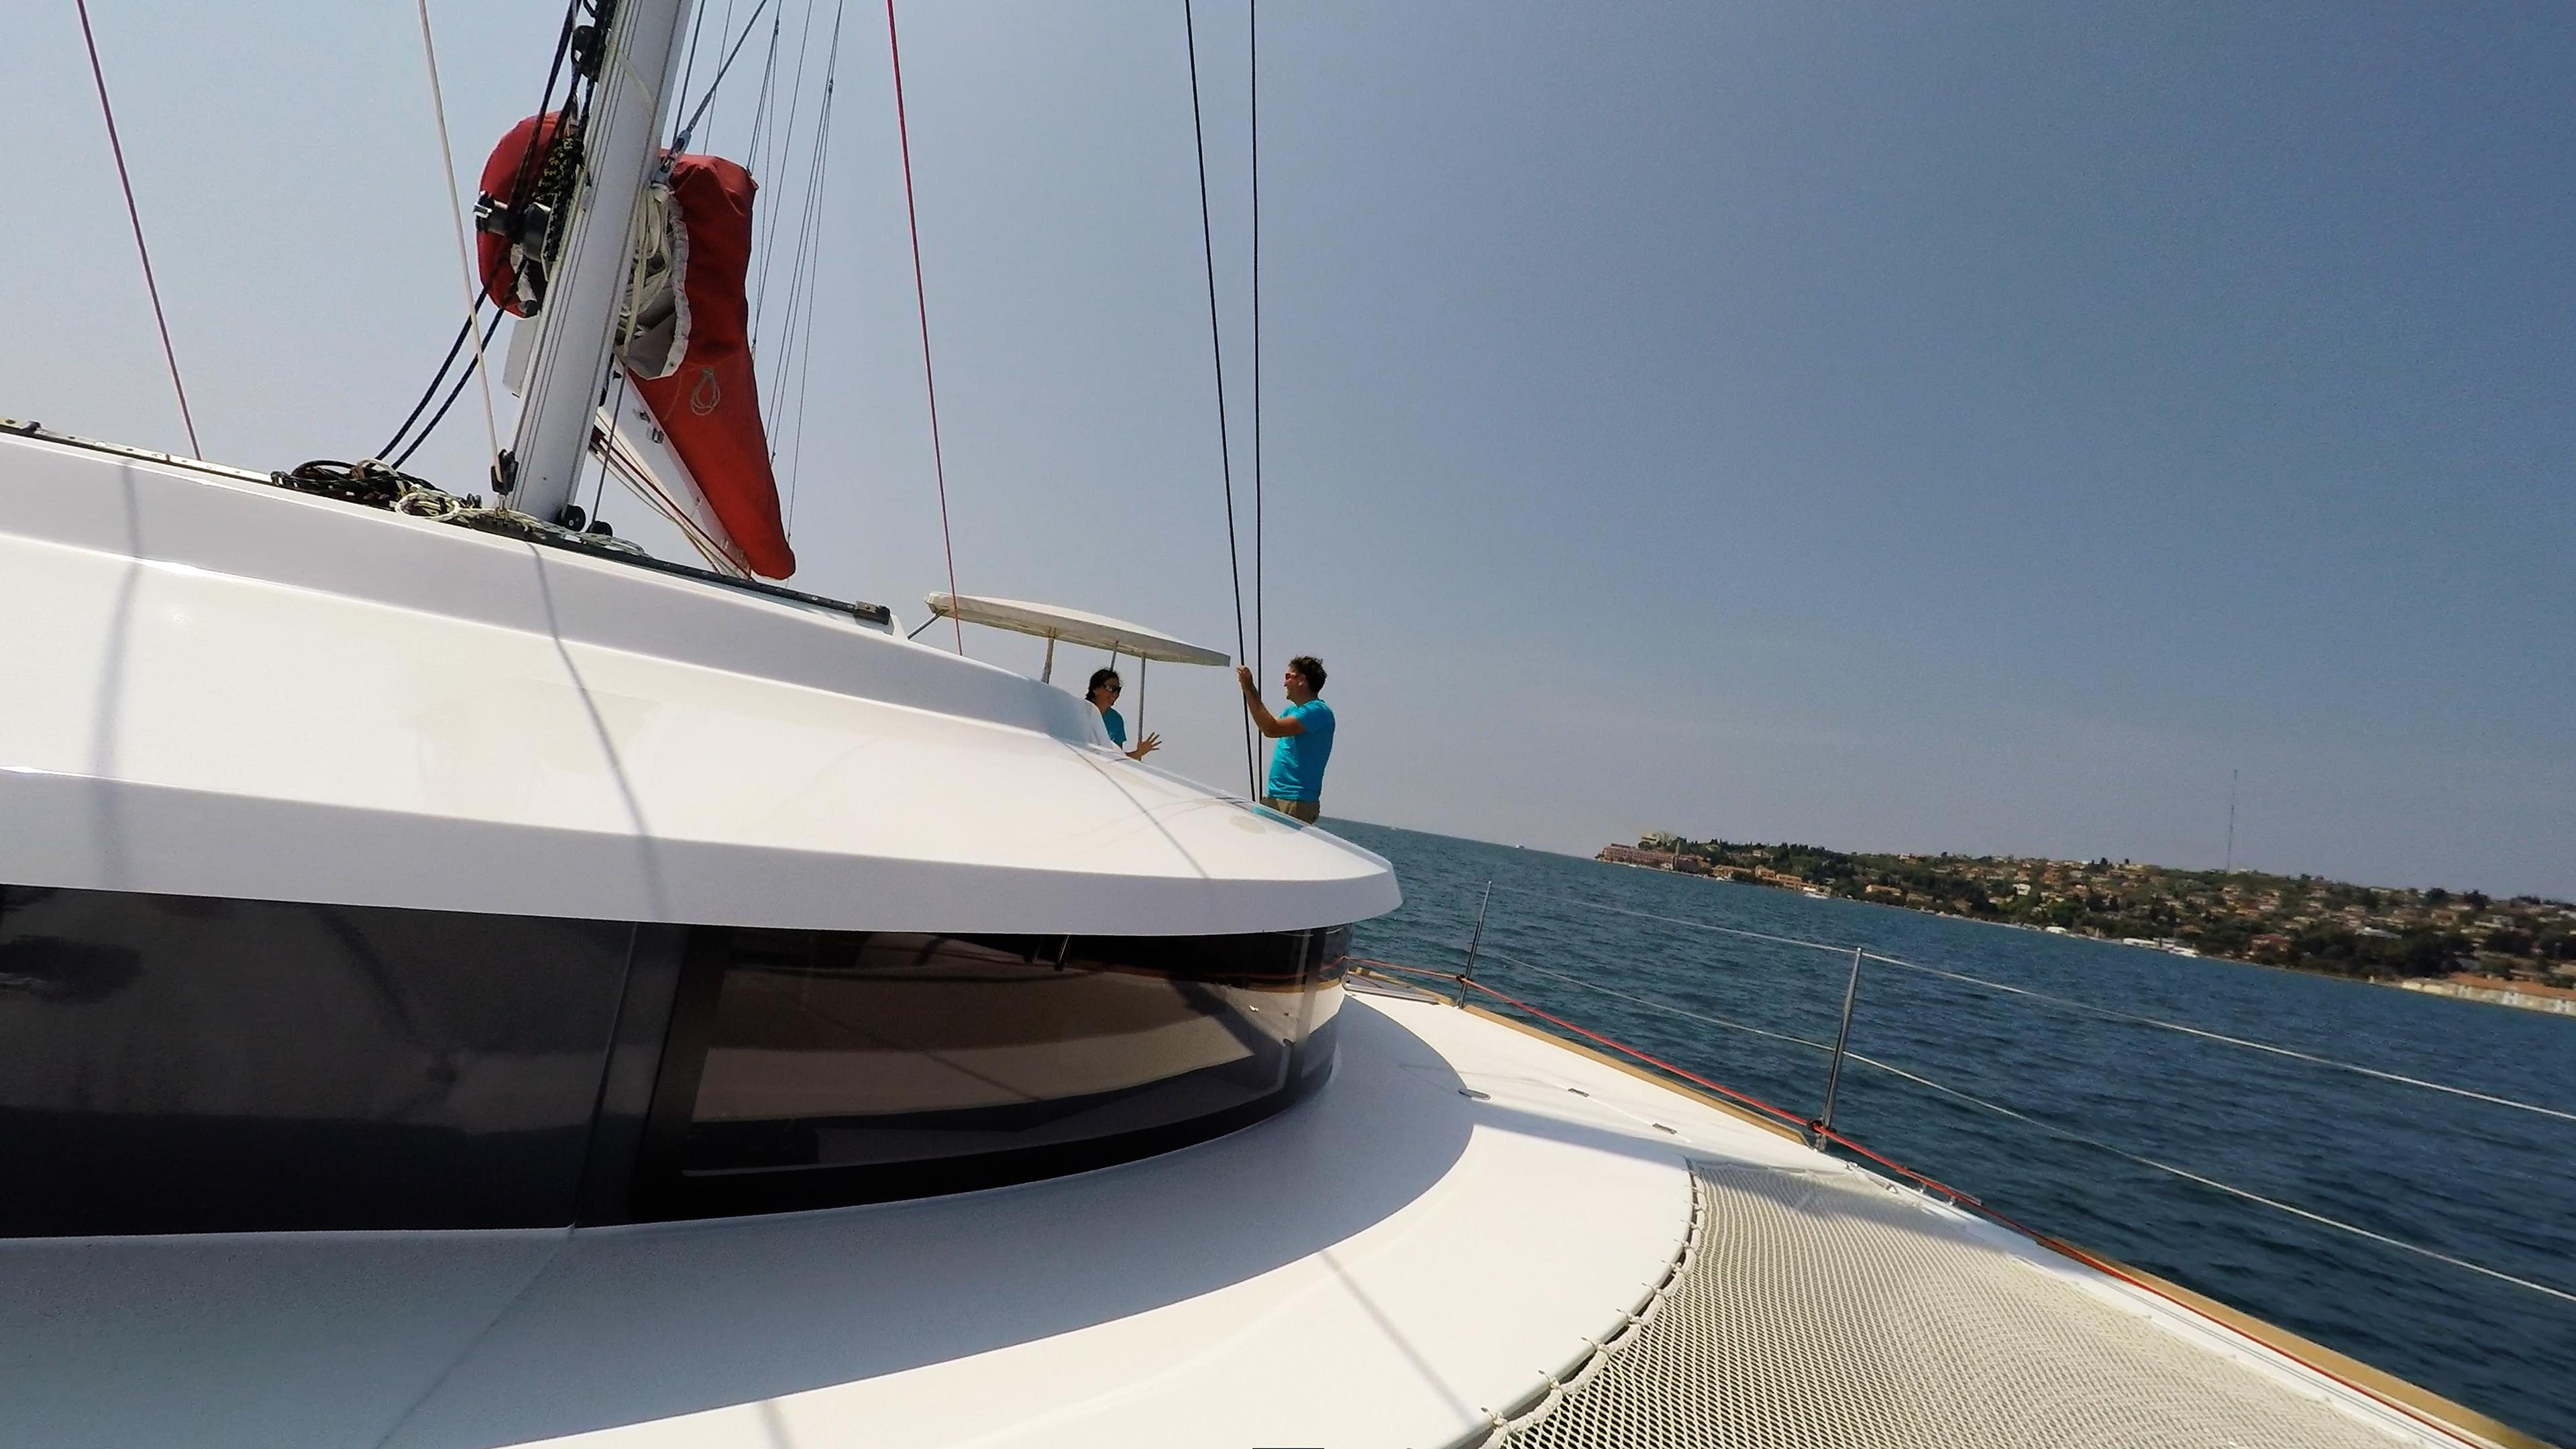 coperta salon neel 45 trimarano barca a vela